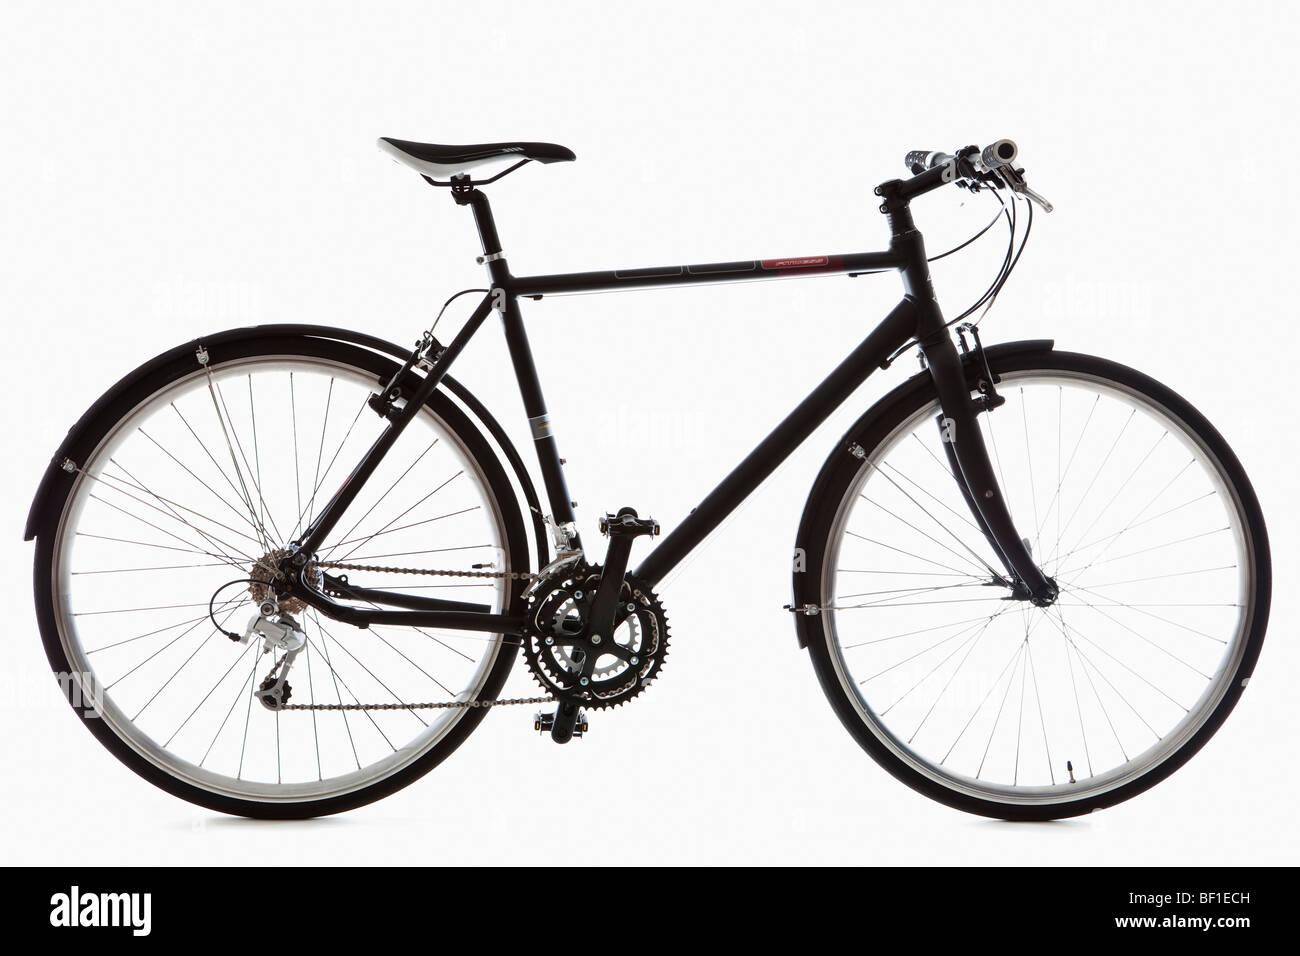 A mountain bike, still life, studio shot - Stock Image